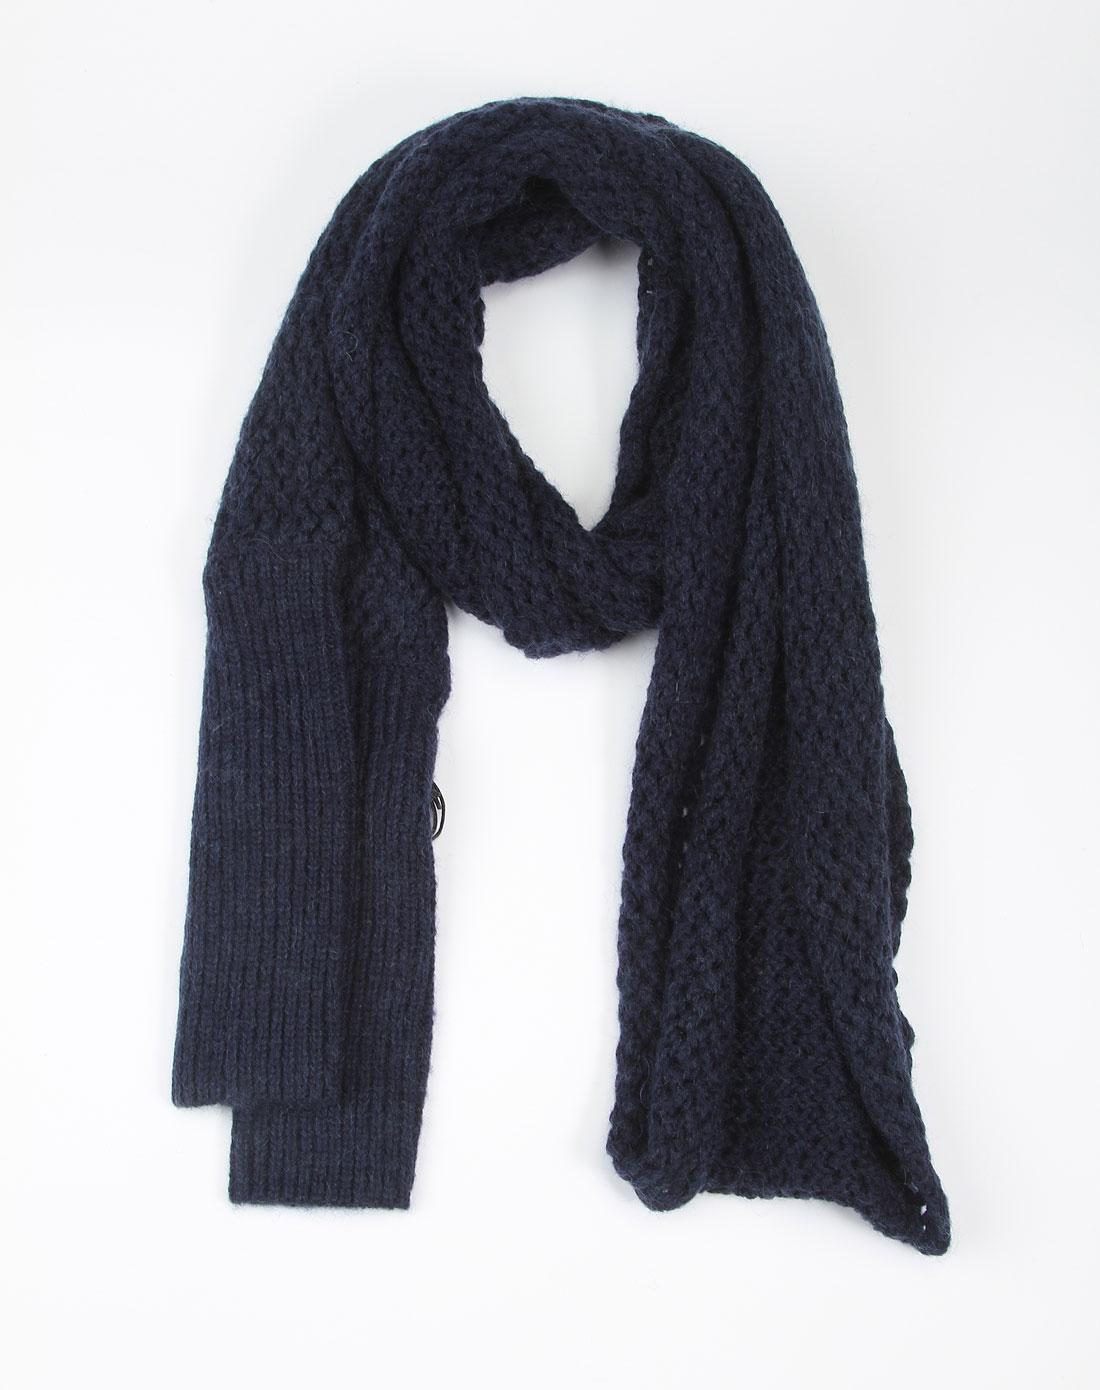 ppt 蓝色镂空长围巾